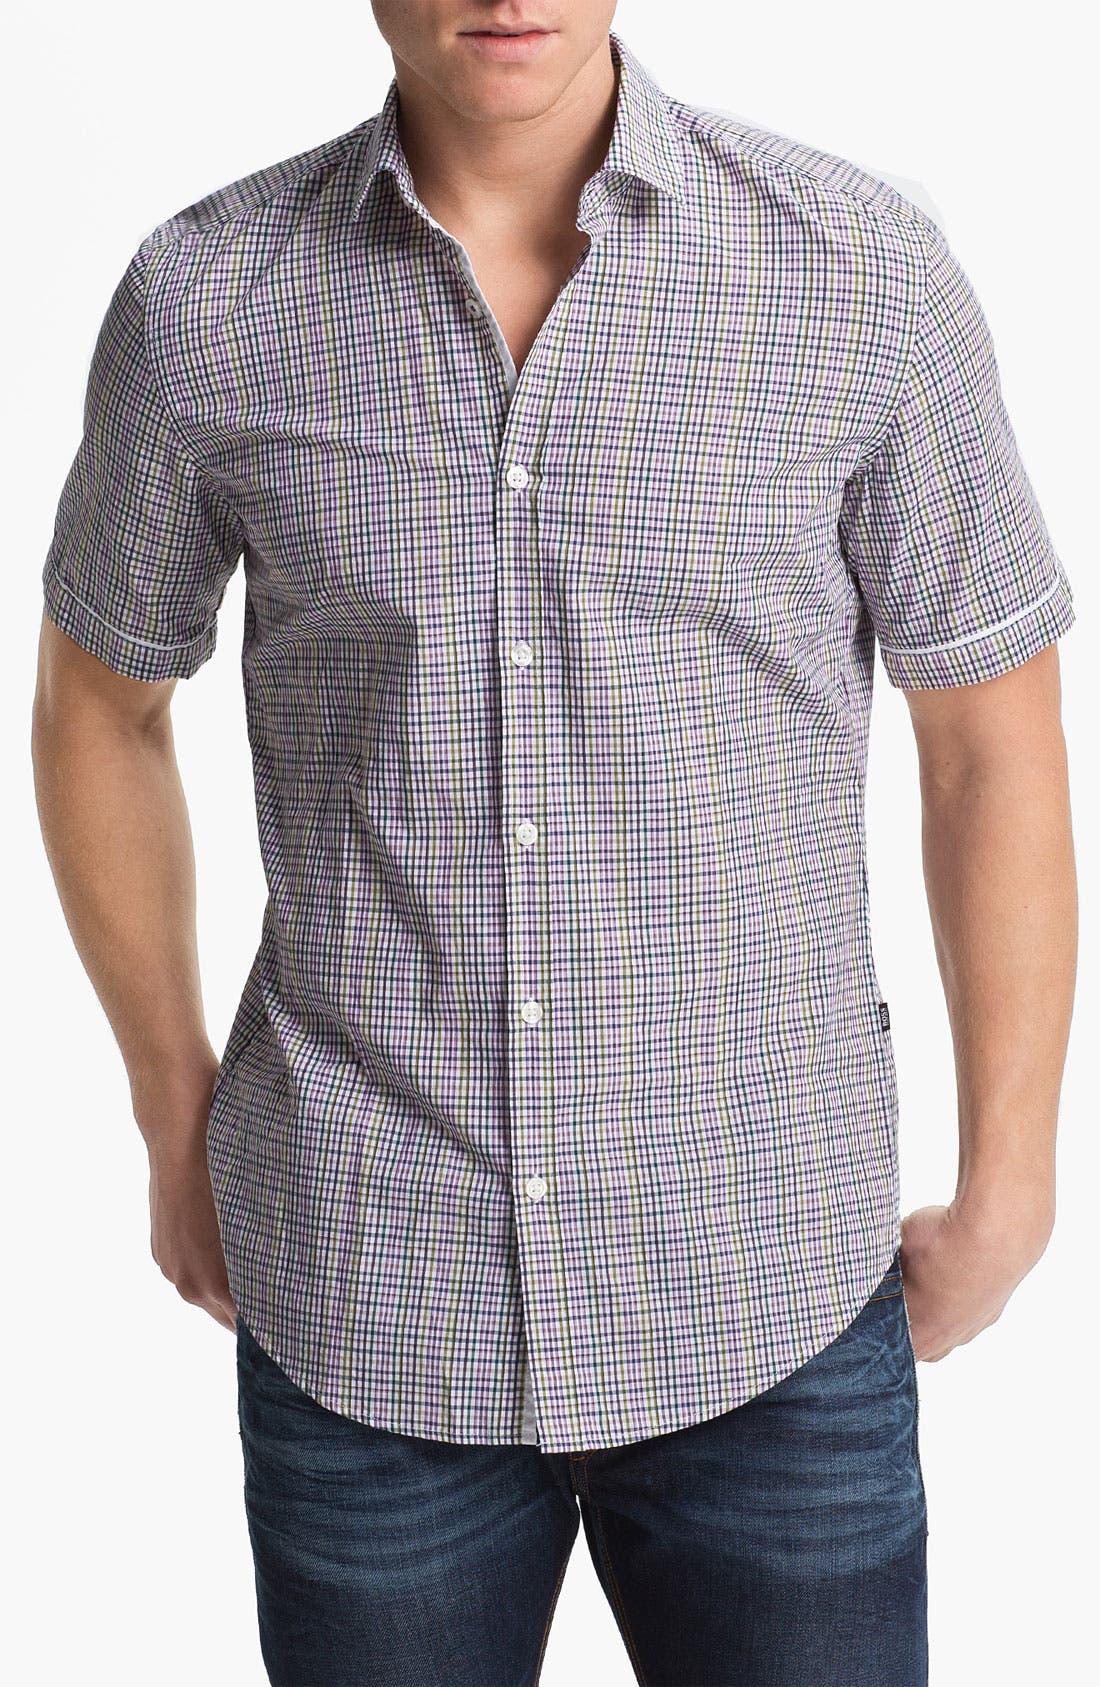 Alternate Image 1 Selected - BOSS Black 'Ring 1' Slim Fit Sport Shirt